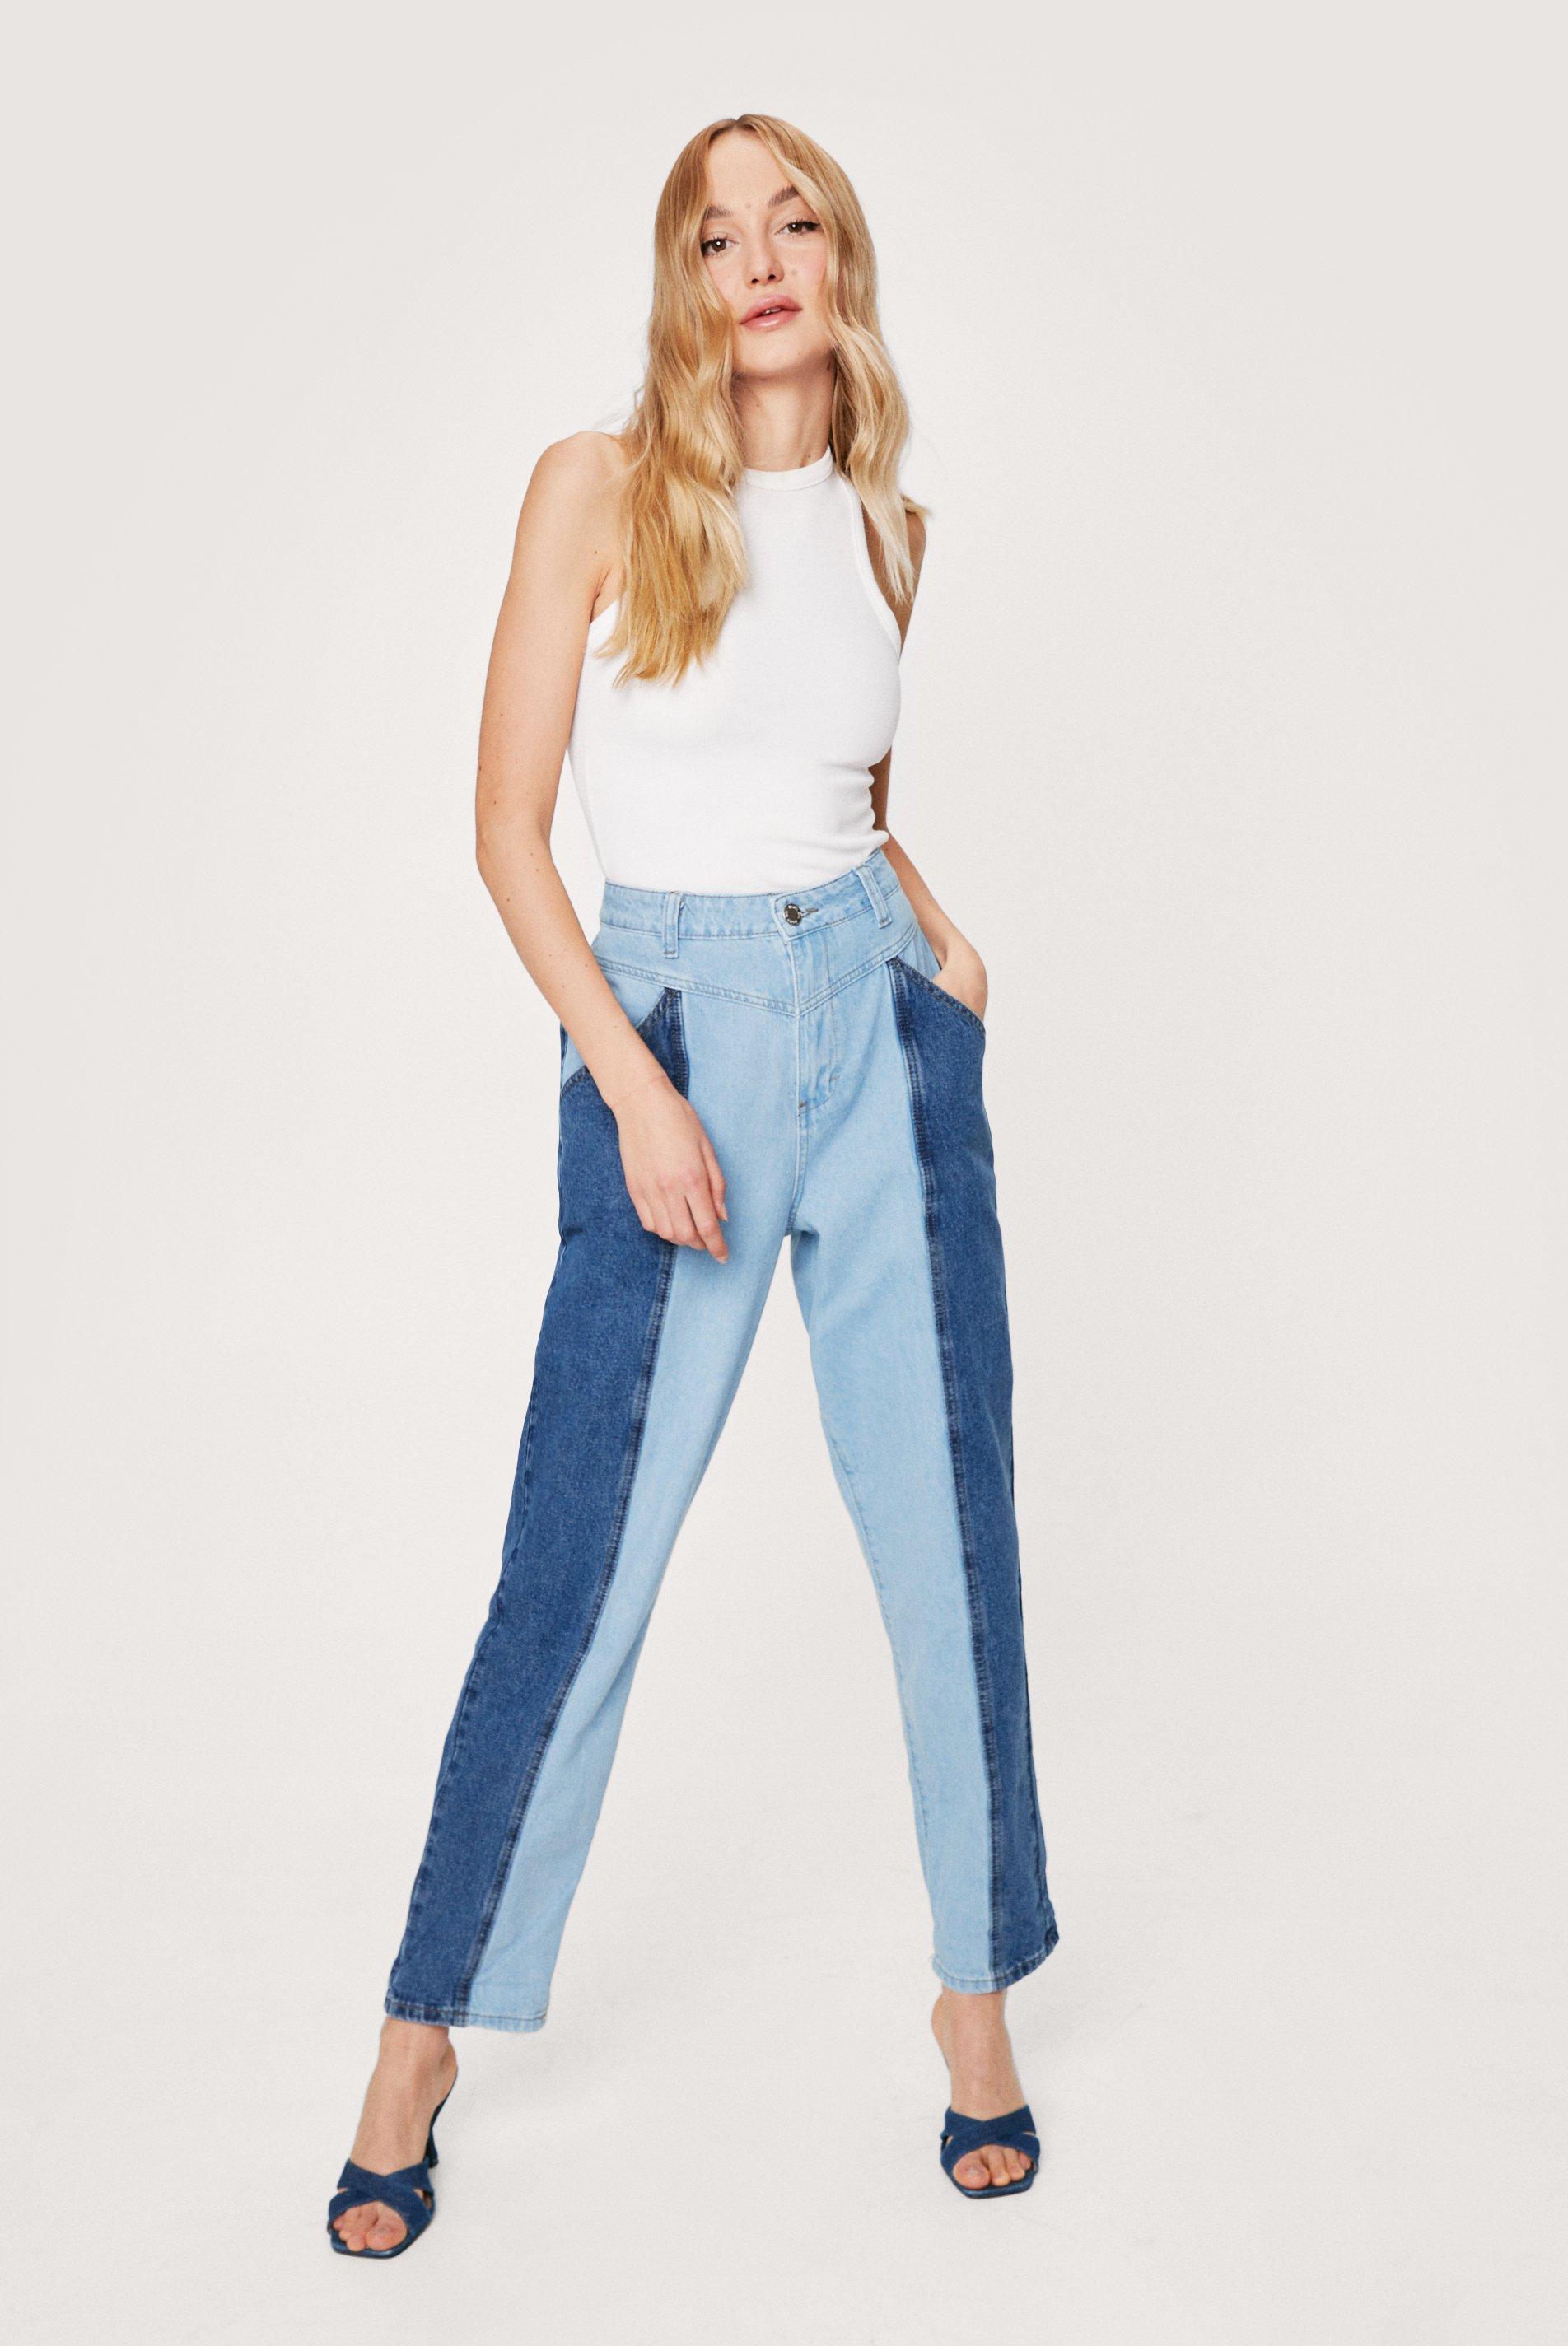 80s Jeans, Pants, Leggings | 90s Jeans Womens Two Tone Denim Mom Jeans - Blue - 10 $24.00 AT vintagedancer.com